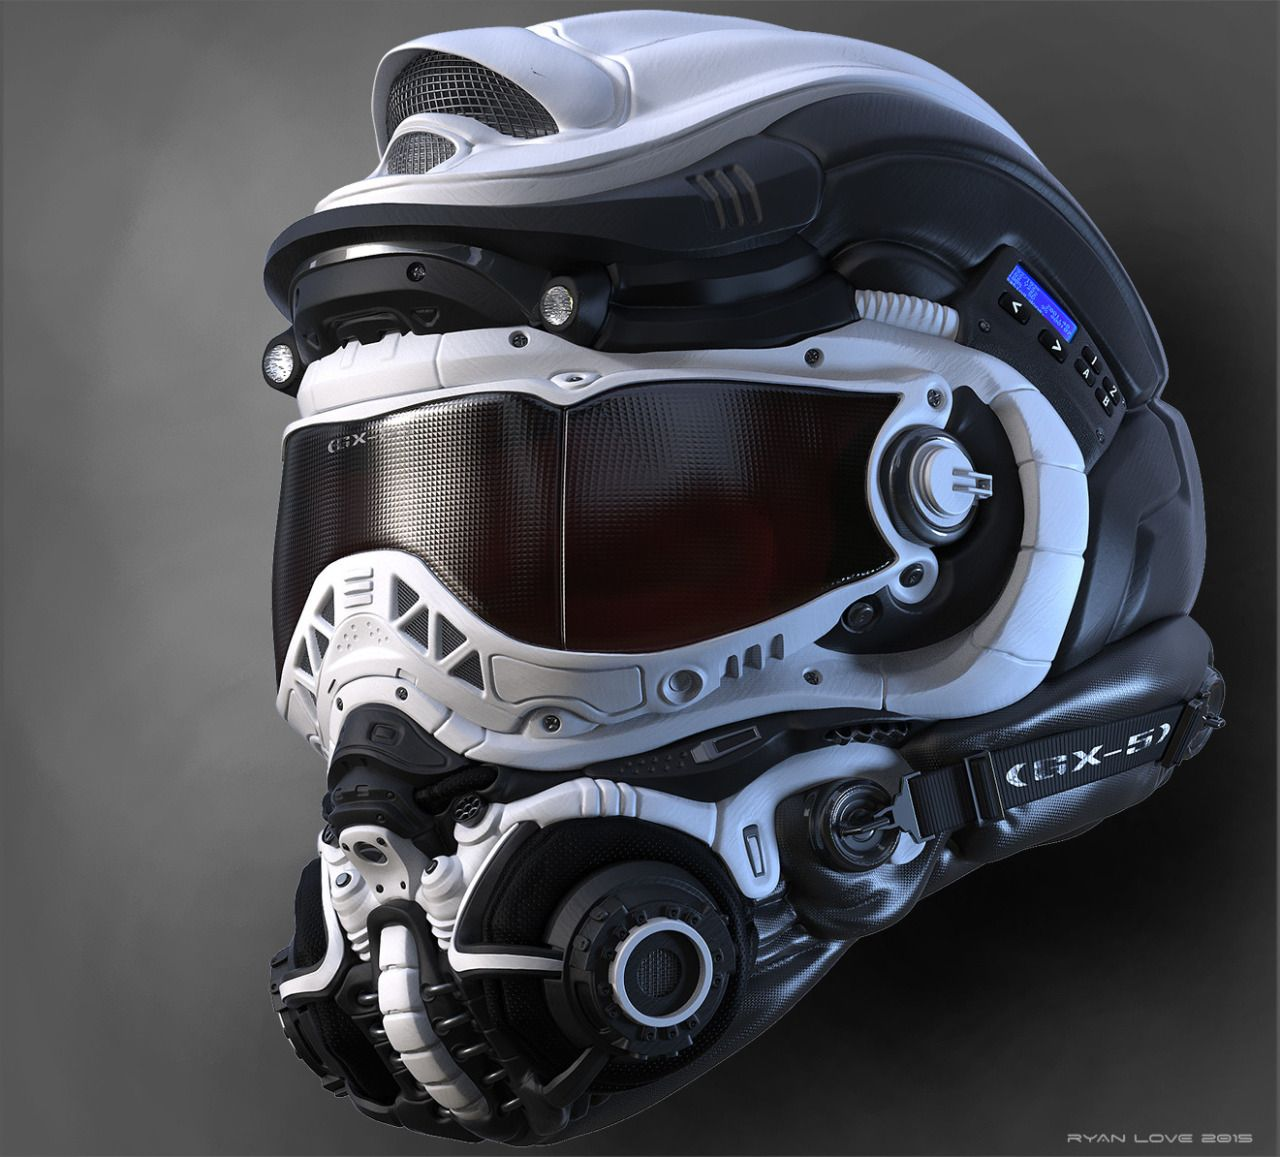 Cyberpunk Images Helmet concept, Futuristic helmet, Helmet